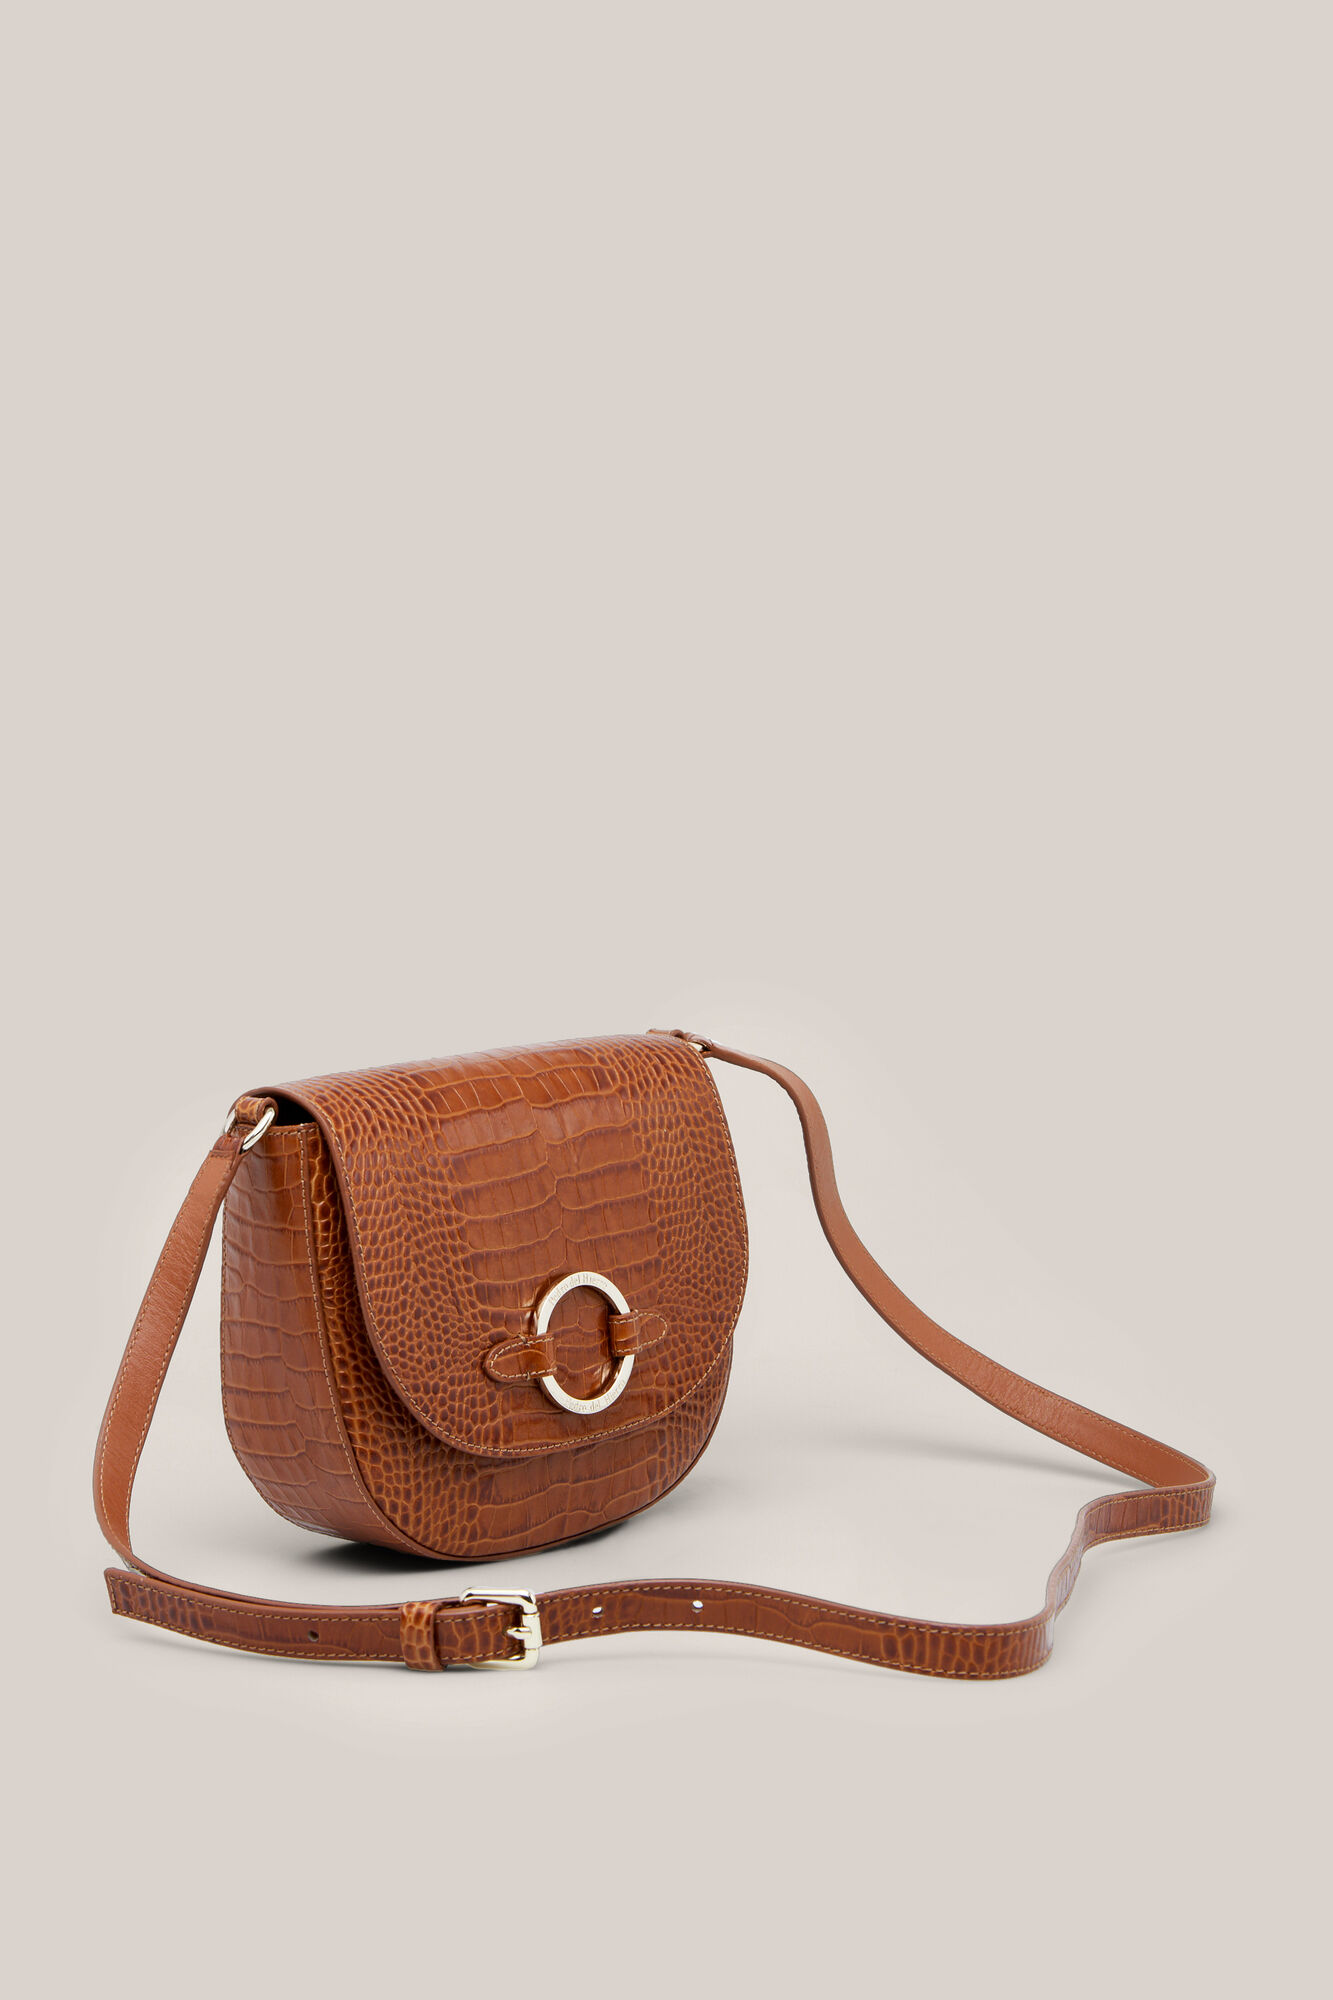 Crocodile Effect Leather Crossbody Bag Handbags Cortefiel Man Woman